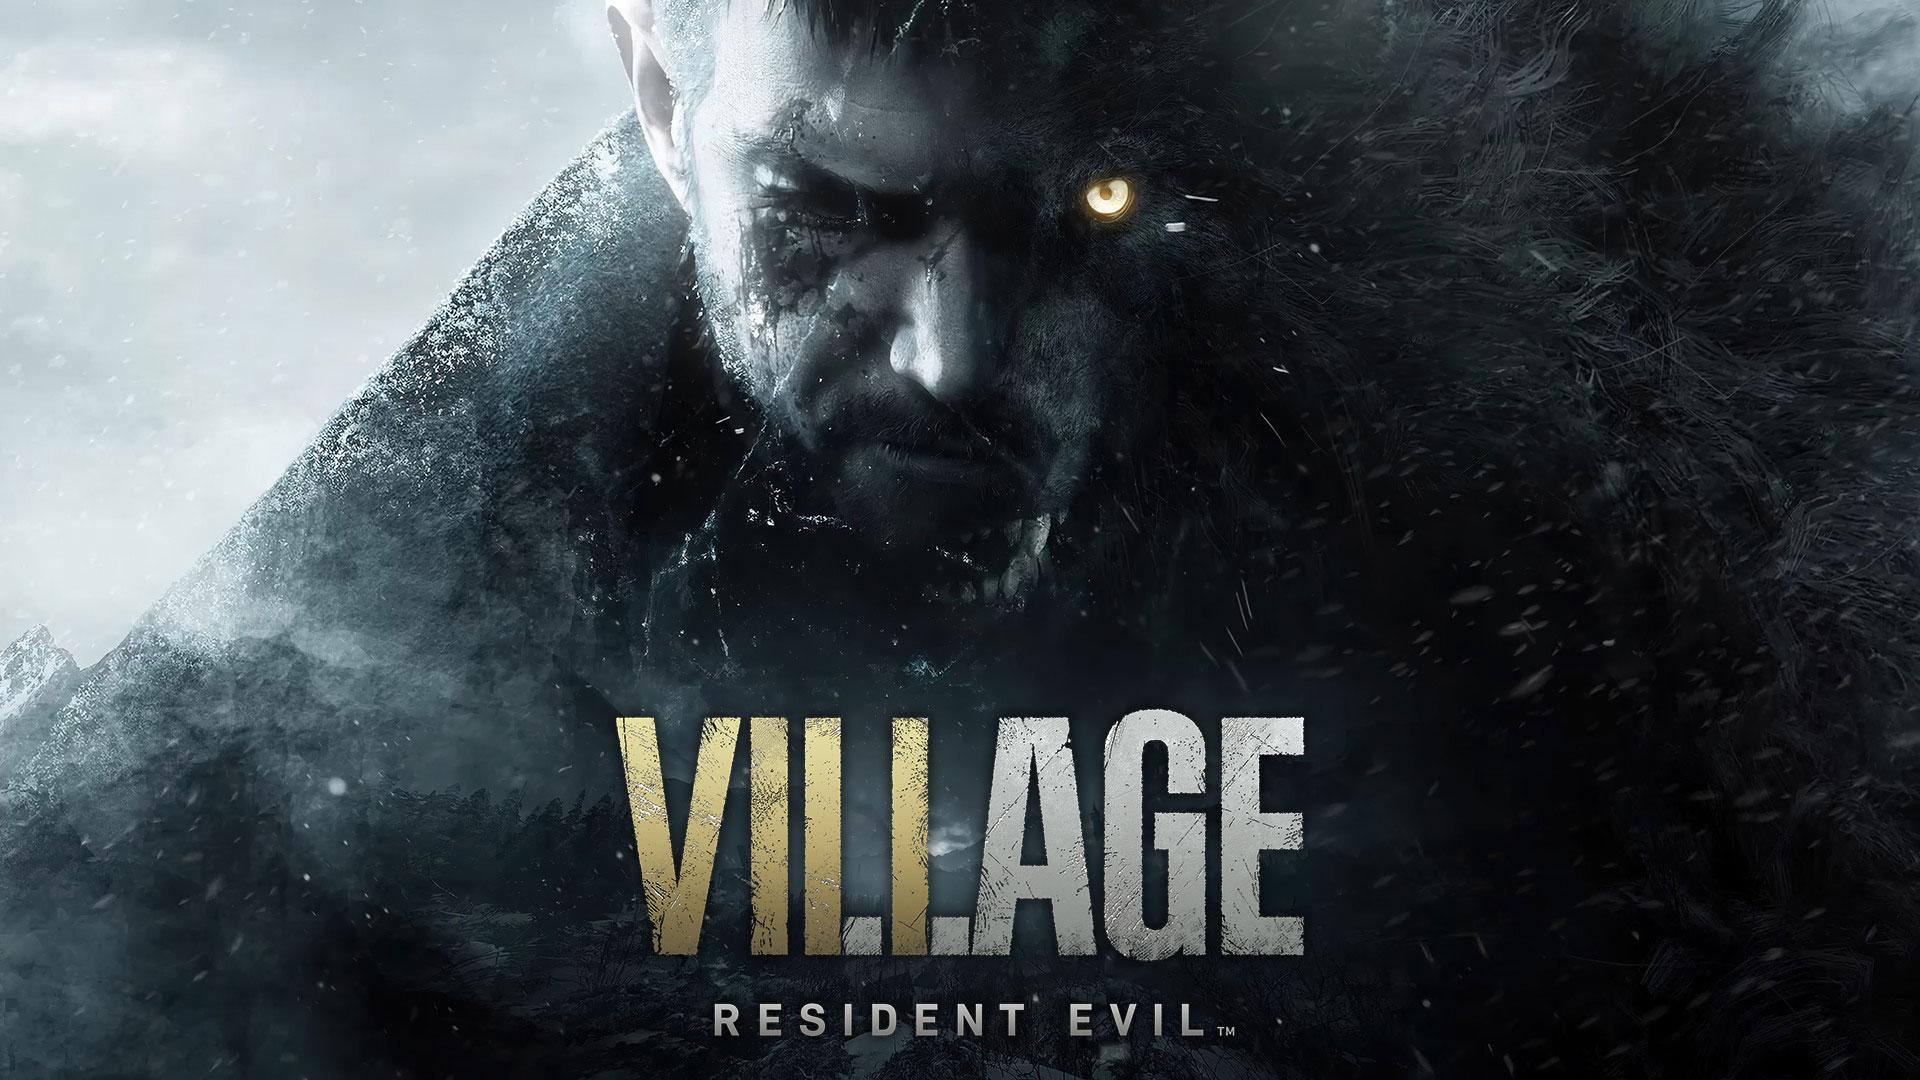 [Análisis] Resident Evil Village, fin e inicio de la nueva era